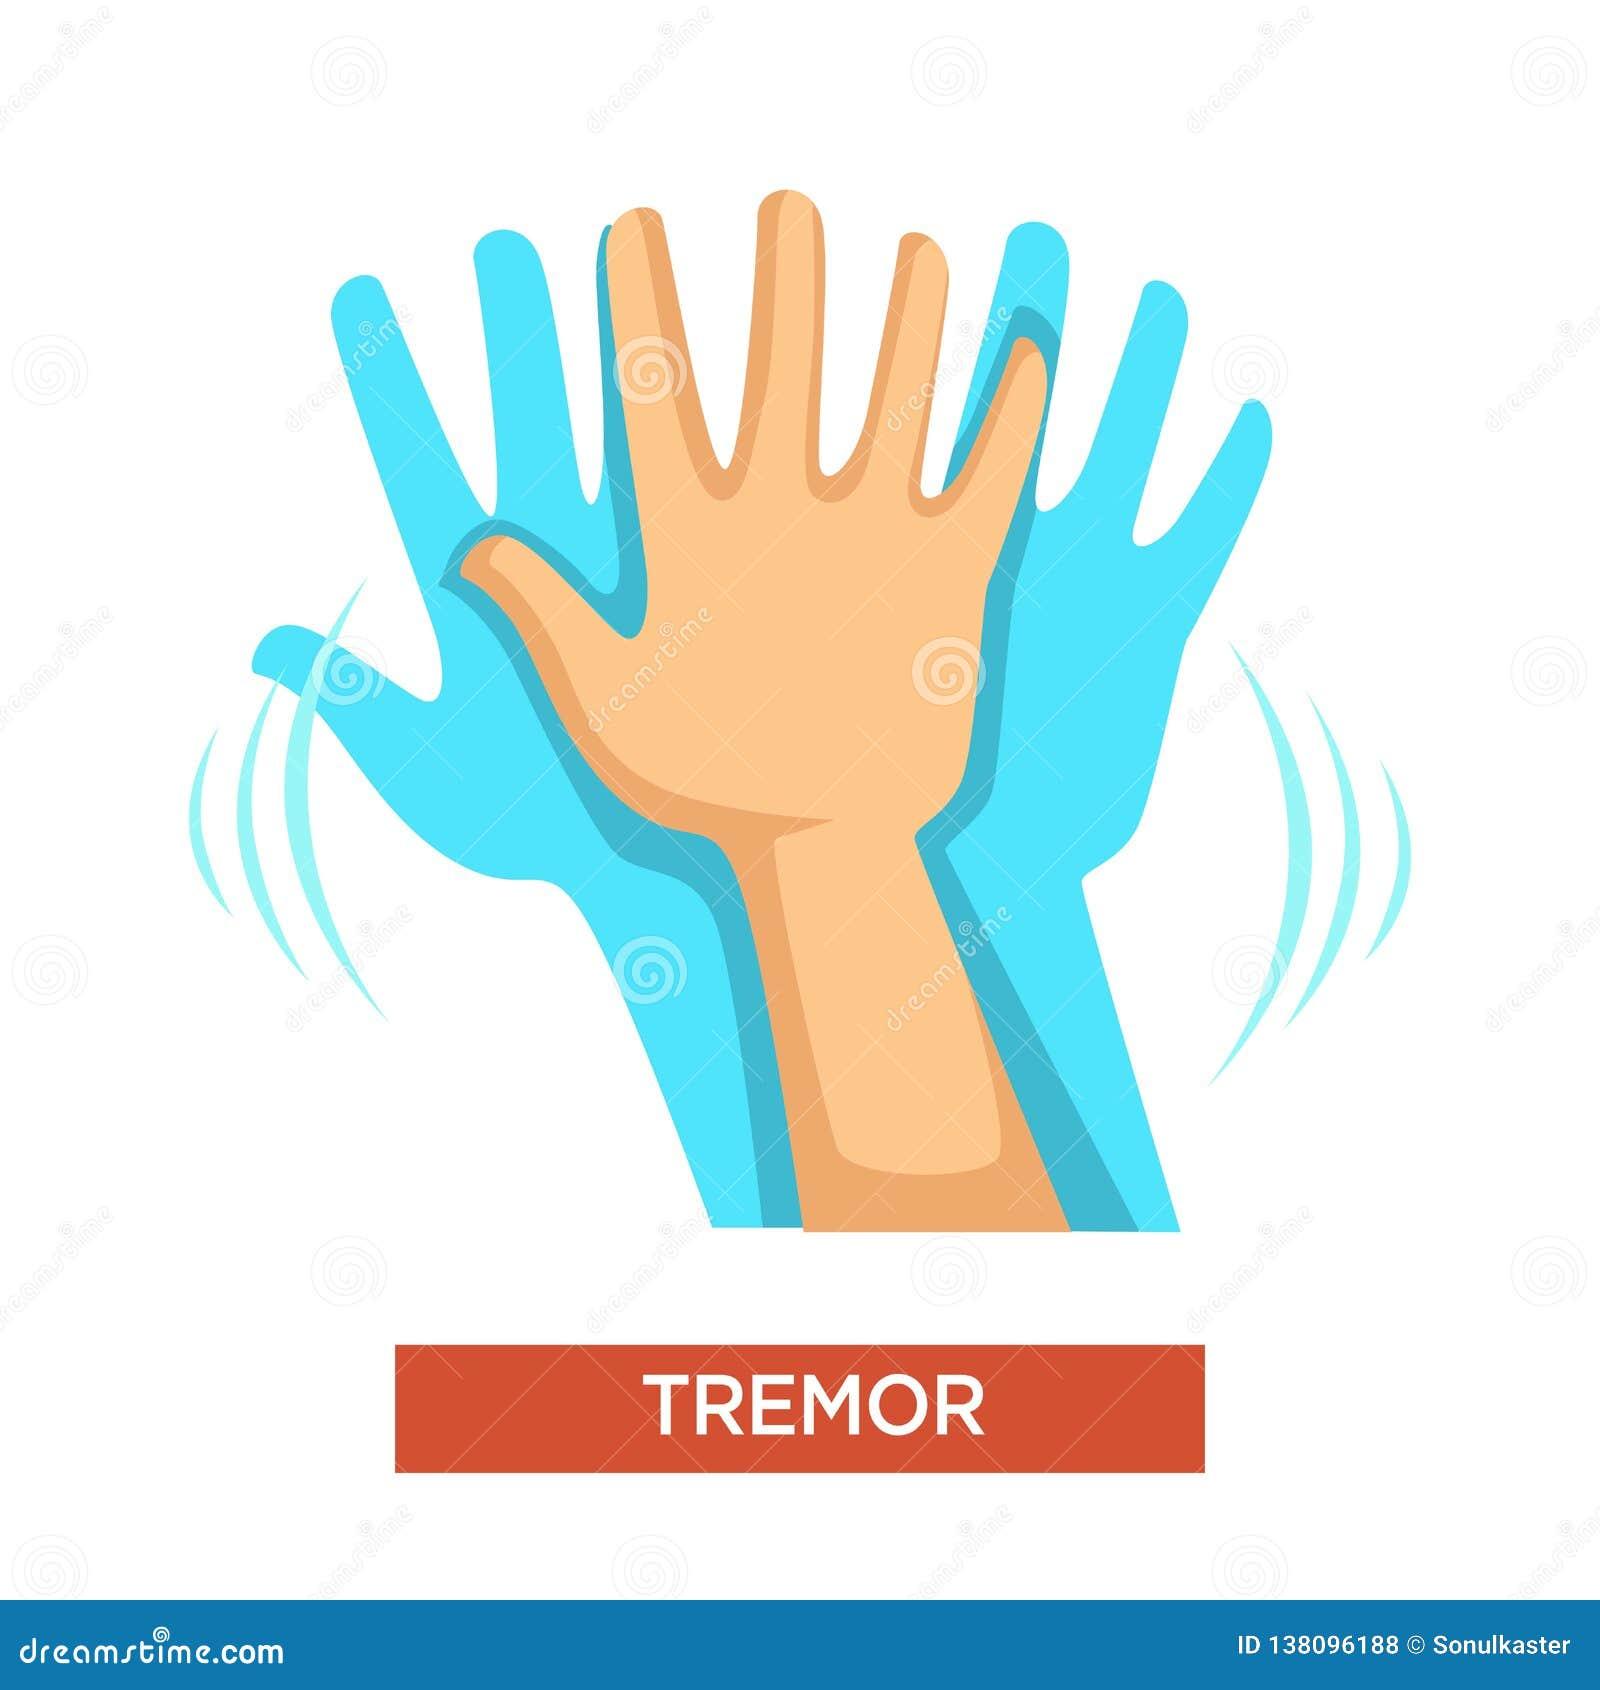 Hand tremor neurological disorder human body part